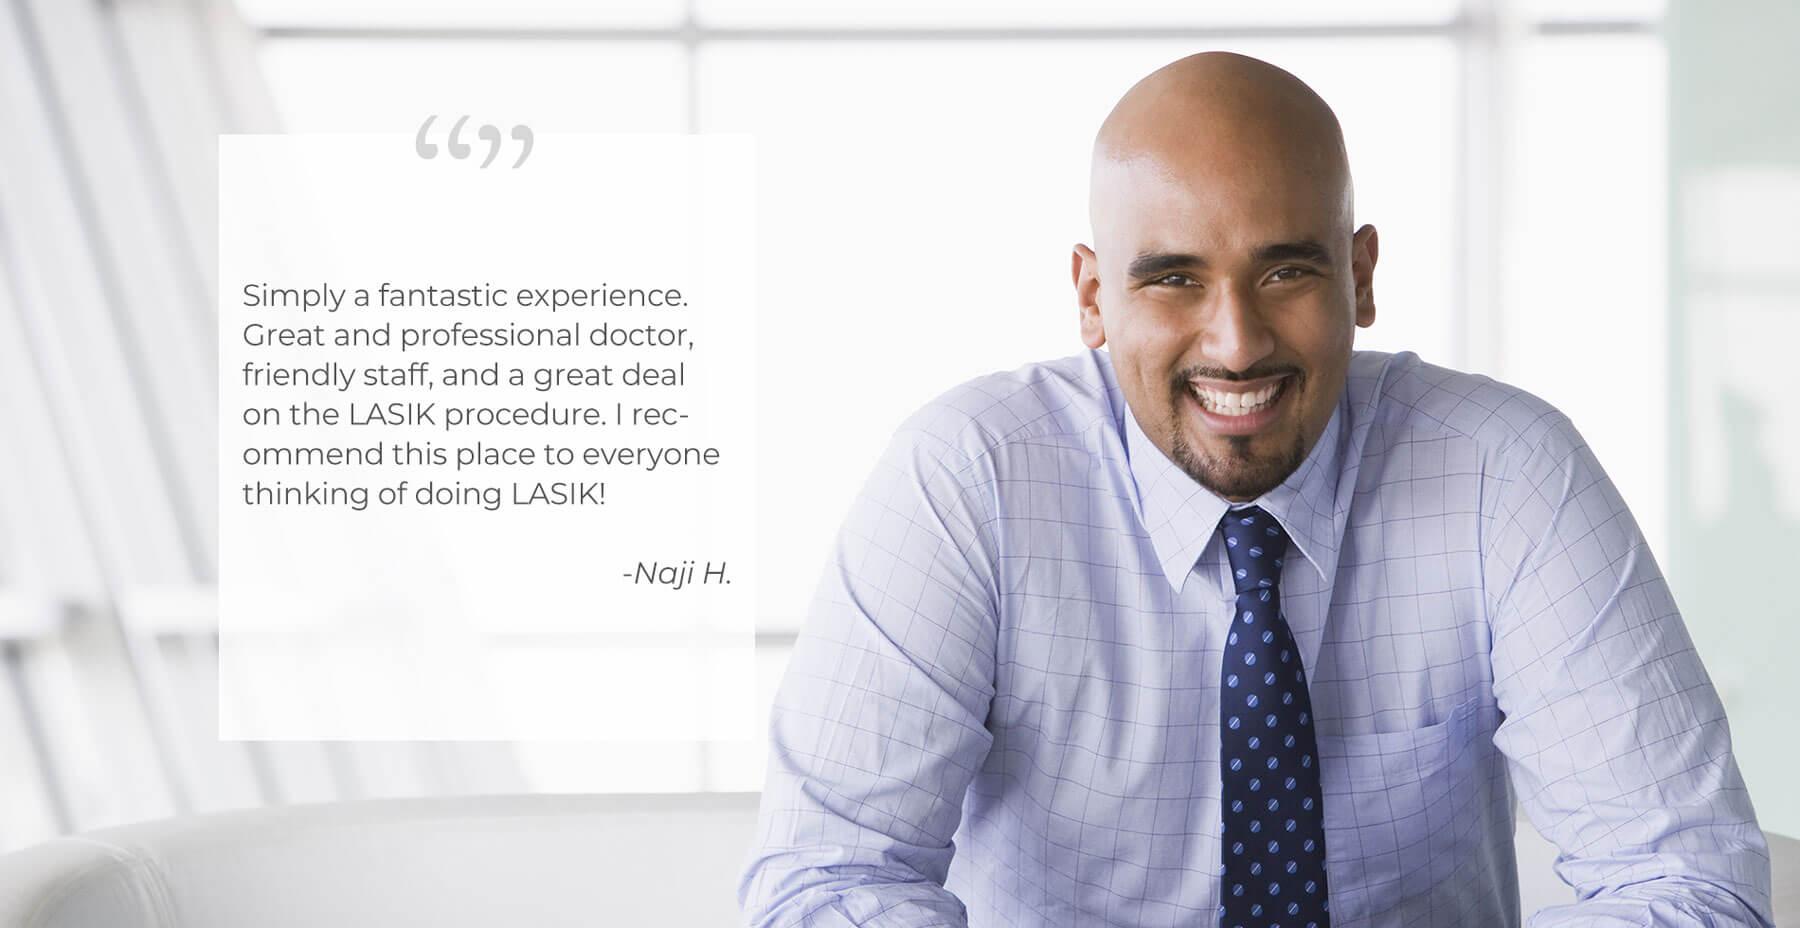 Family Eye Physicians lasik eye surgery testimonial from Naji H.